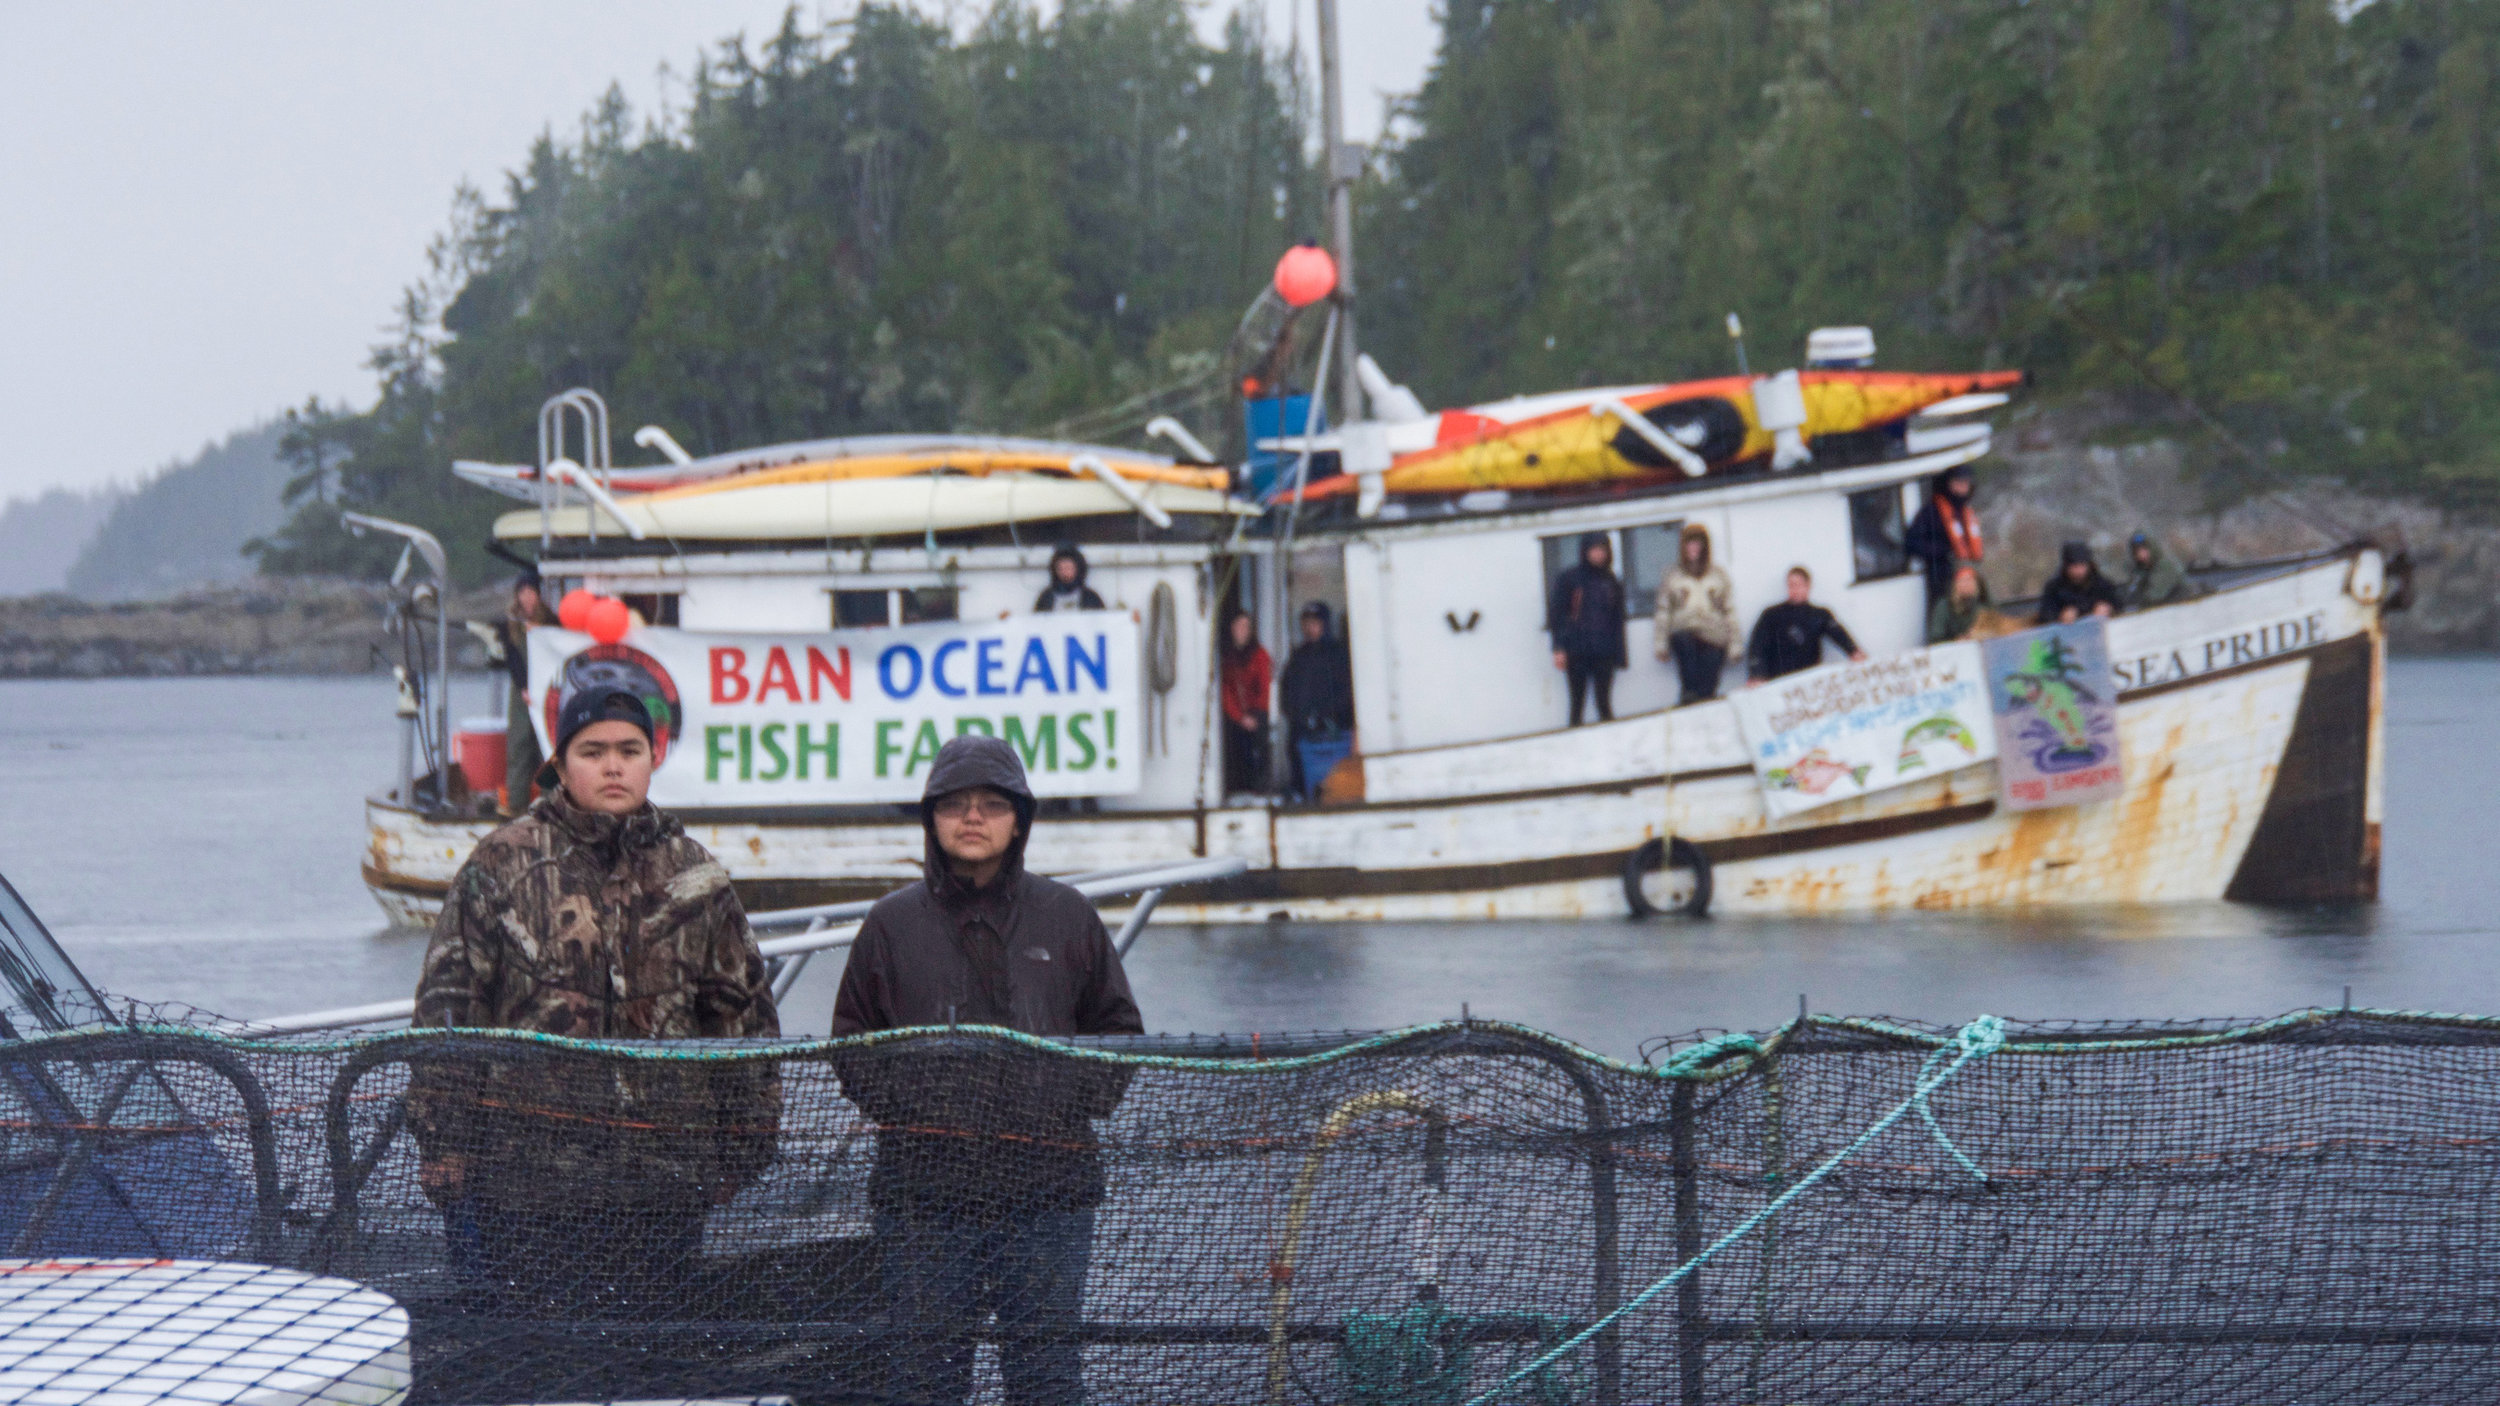 BanOceanFishFarms.jpg